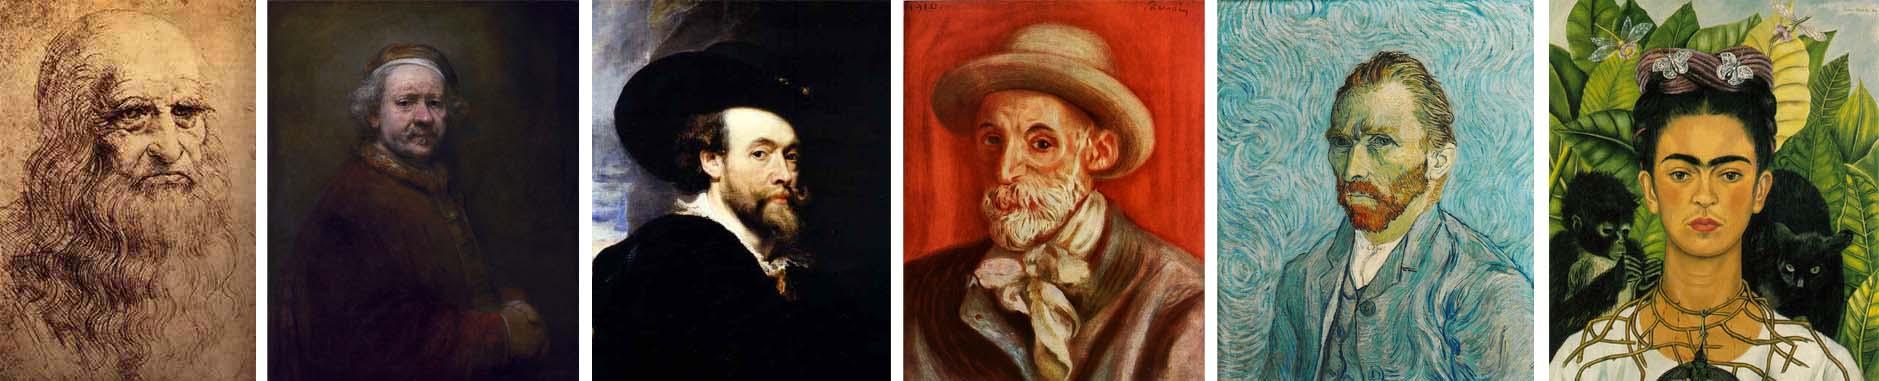 pintura-auto-retratos